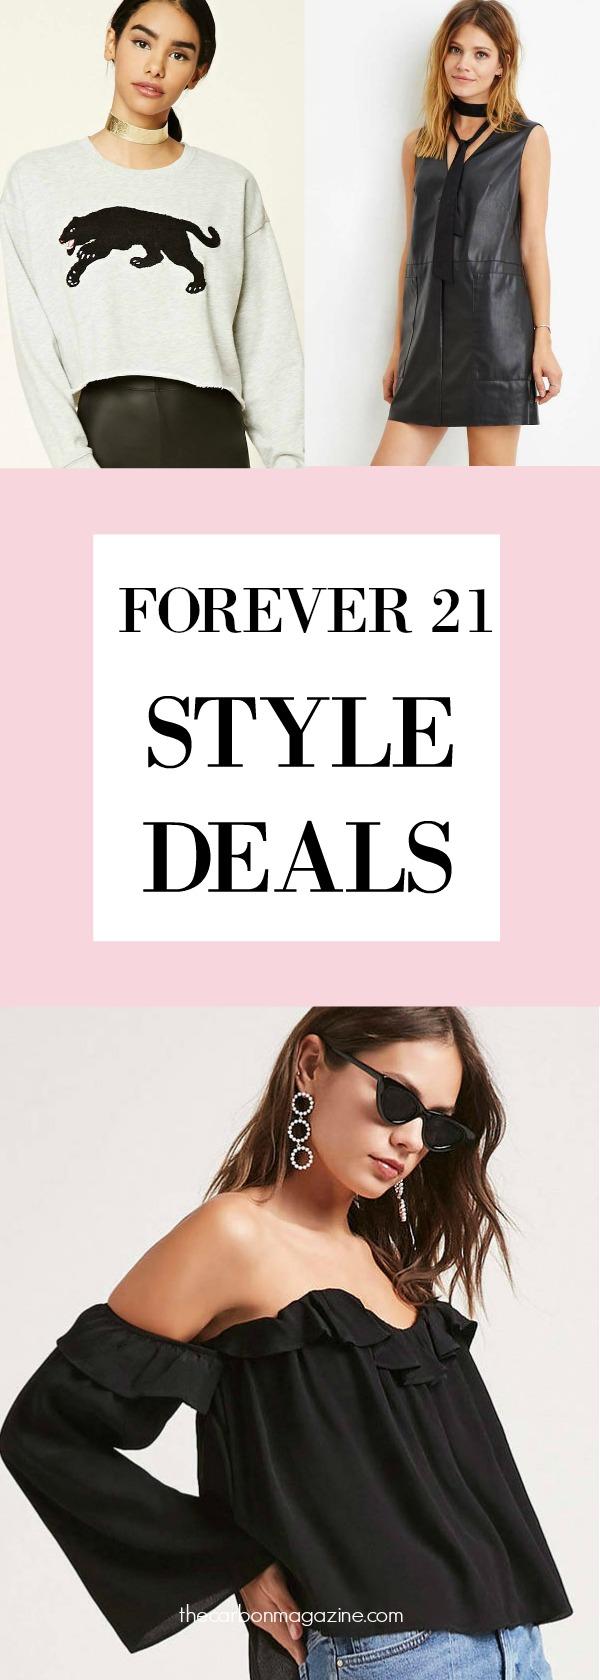 Forever 21 Style Deals November